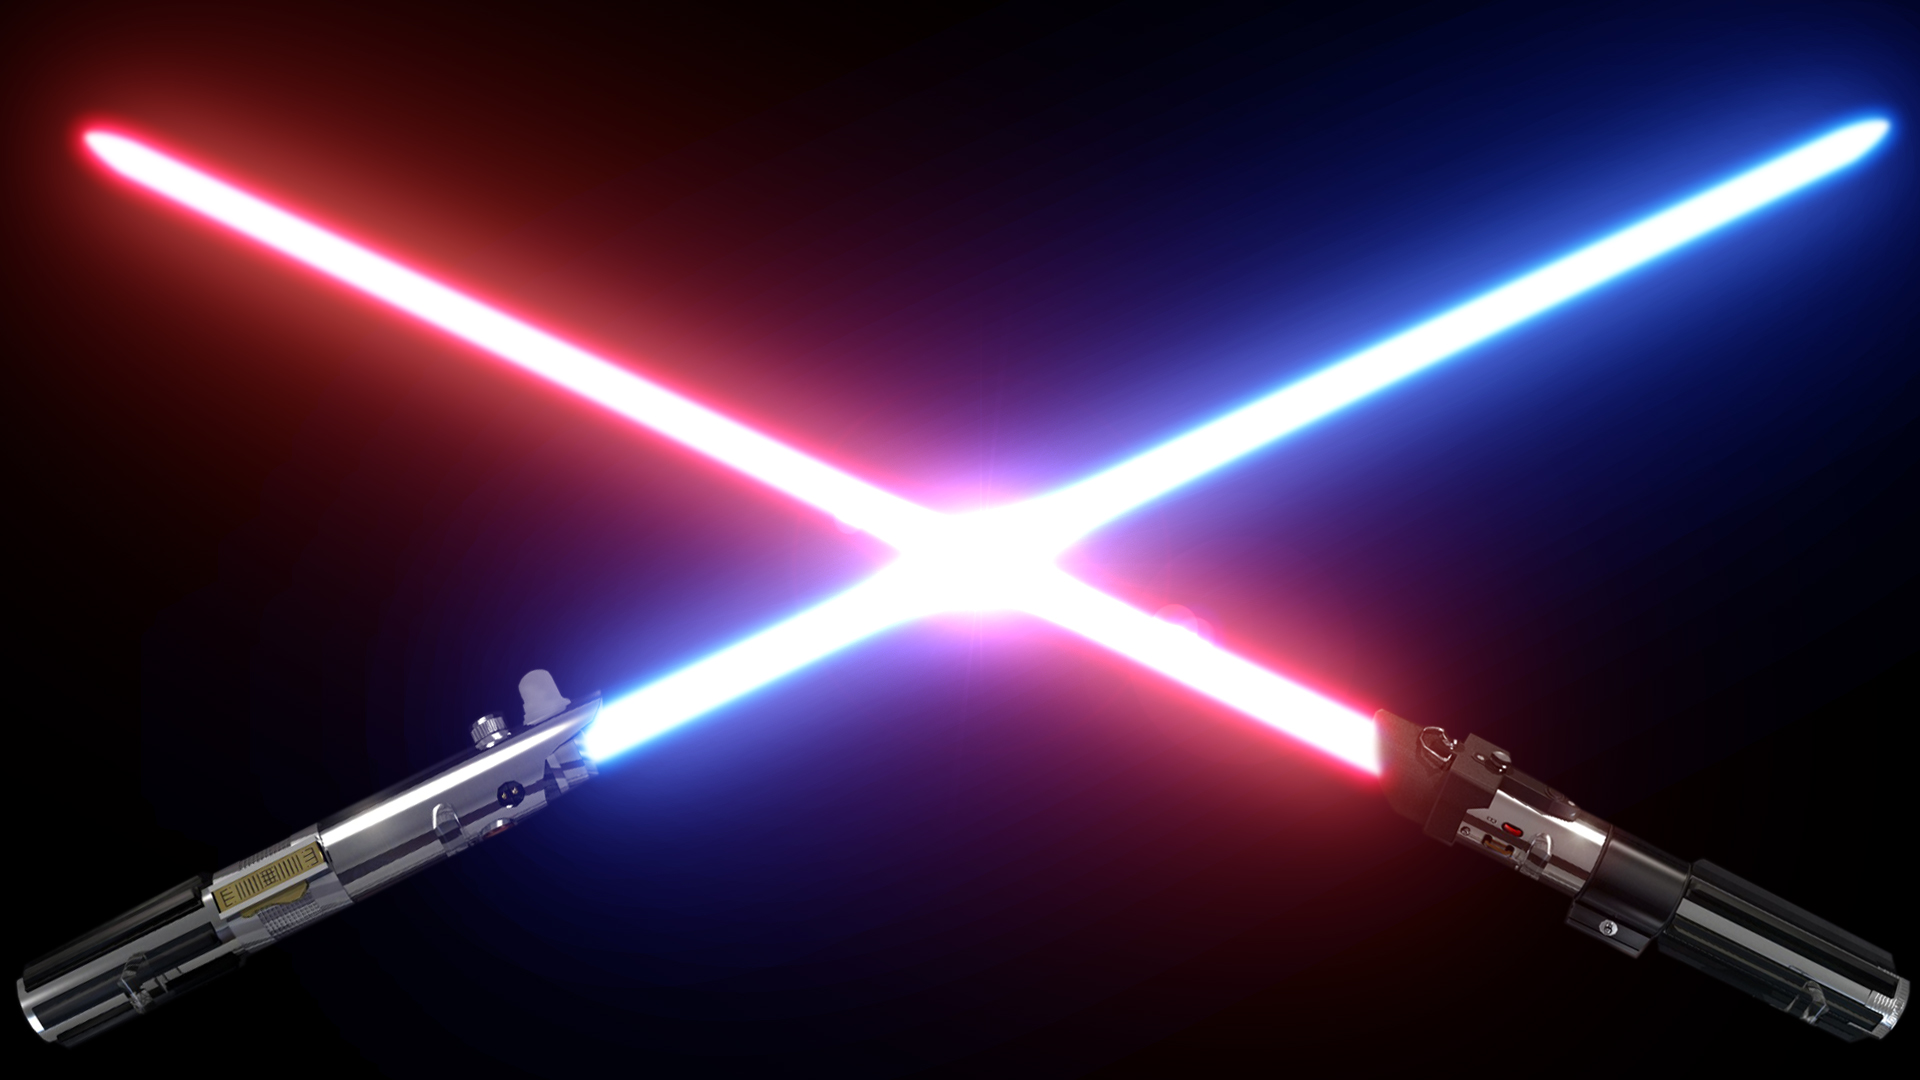 vader lightsaber luke skywalker lightsaber Star Wars Lightsabers 1920x1080